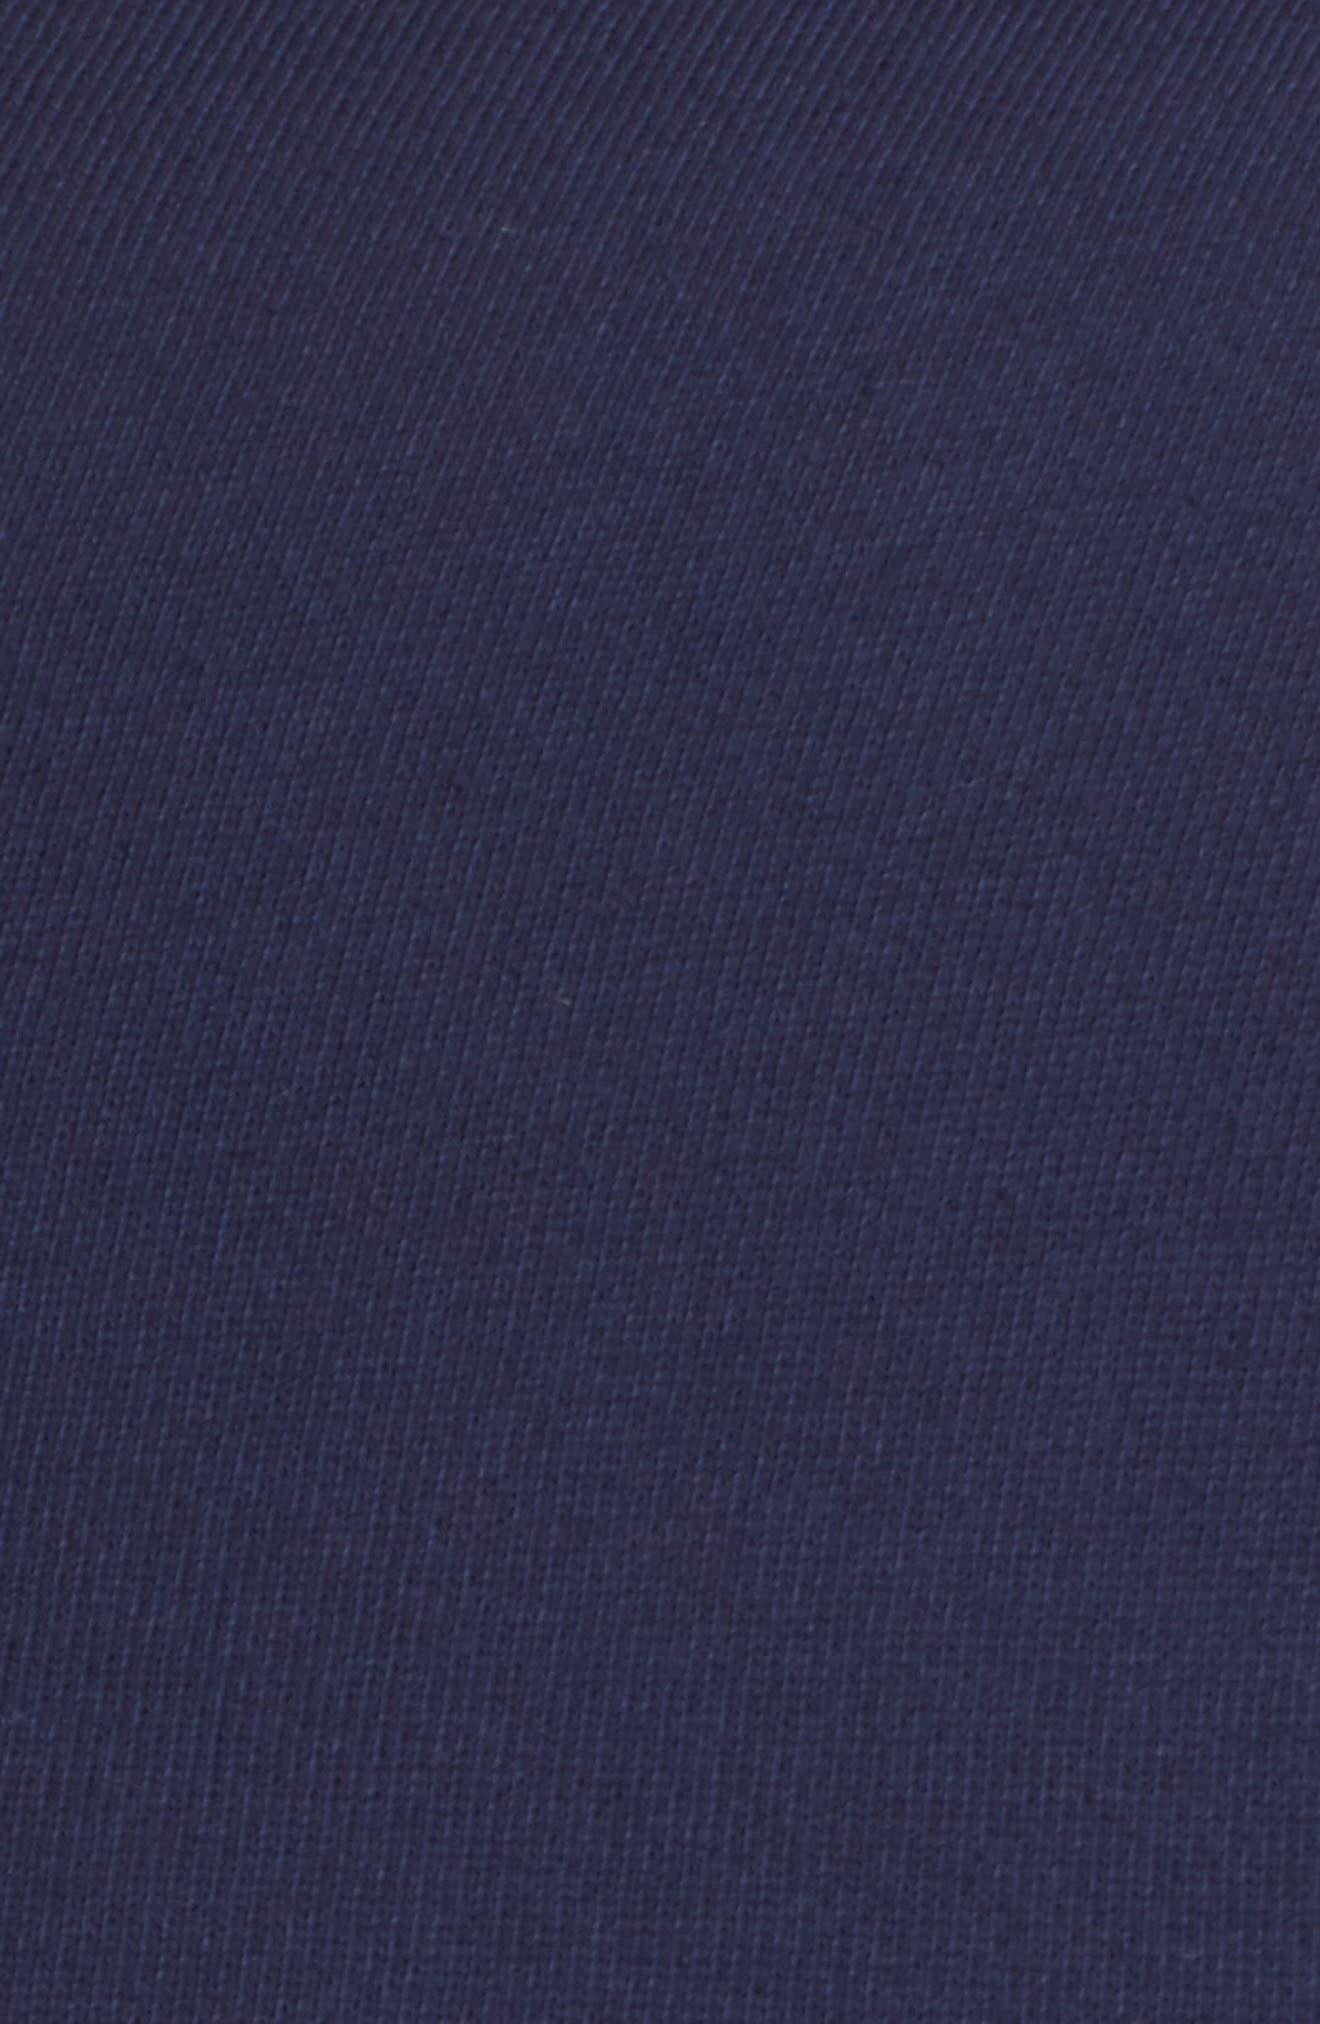 Knit Drape Front Jacket,                             Alternate thumbnail 5, color,                             Navy Peacoat